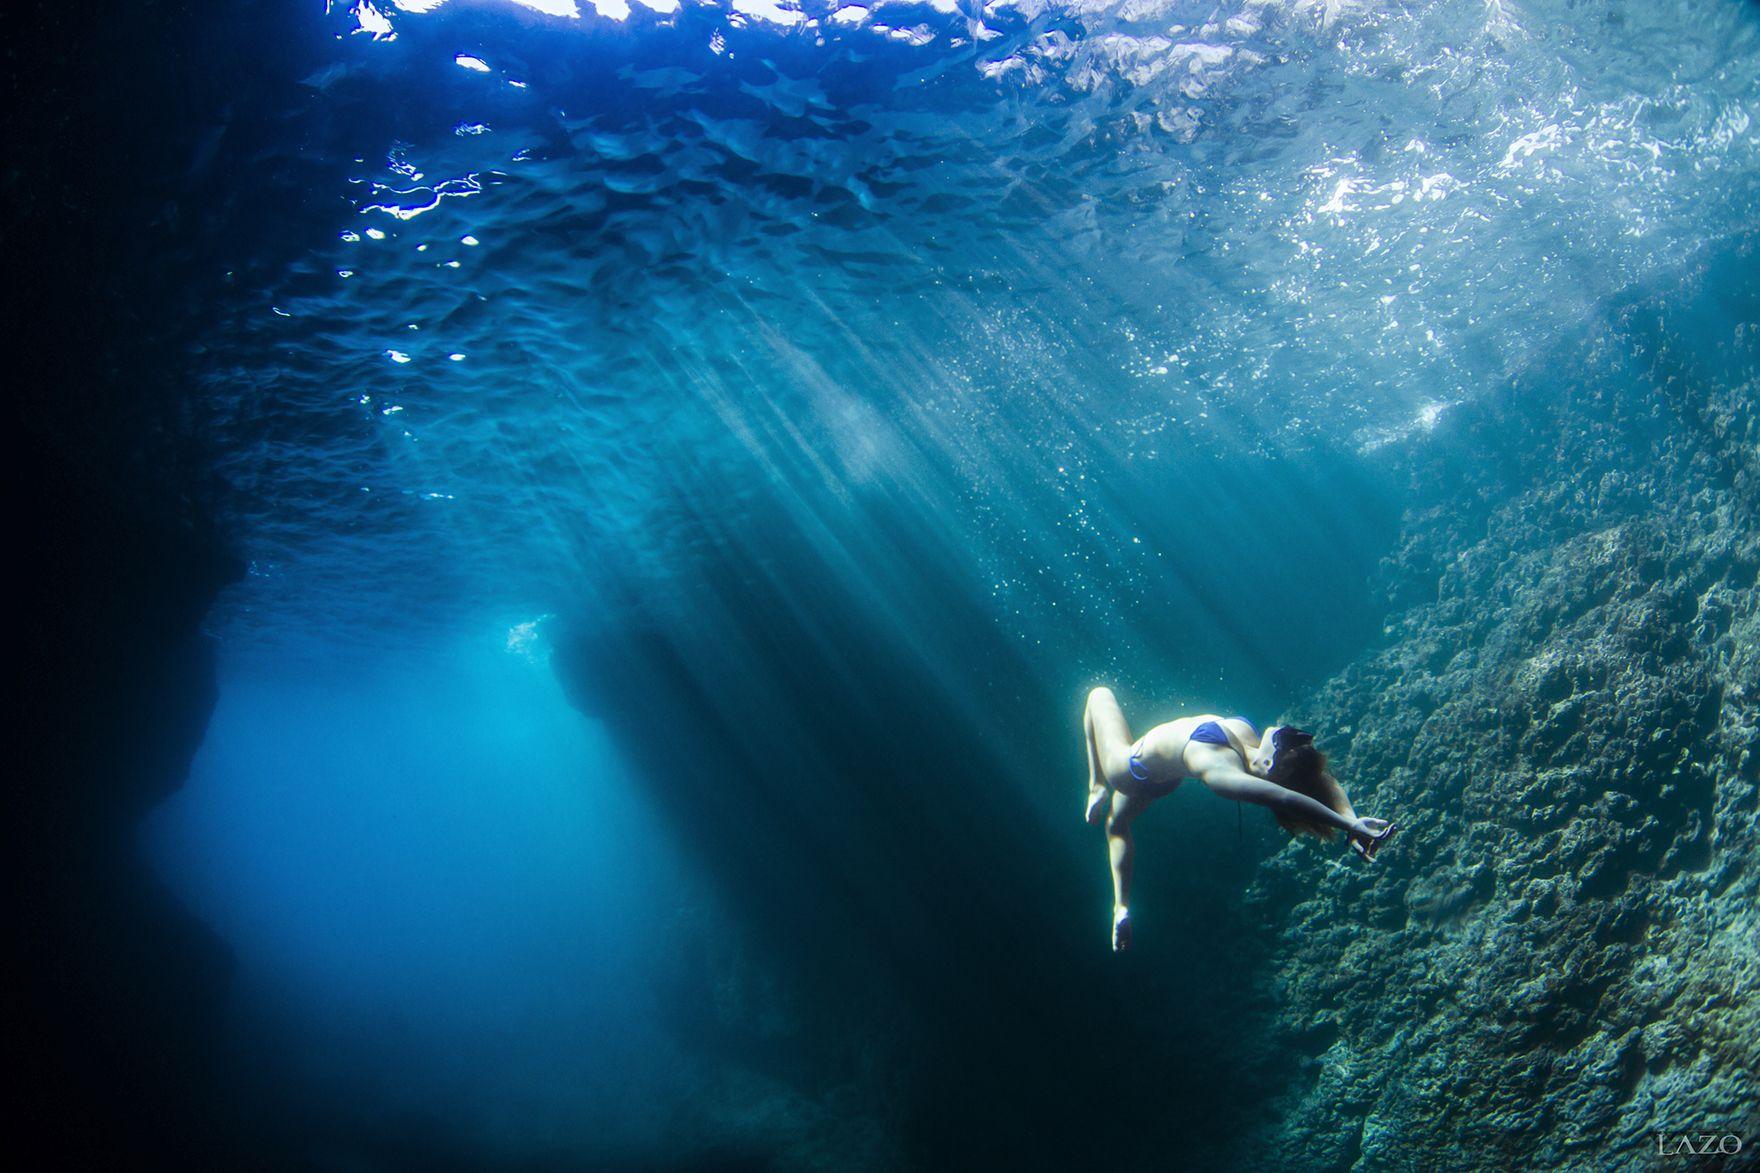 Kauai magic. Dylan Lazo, photographer.